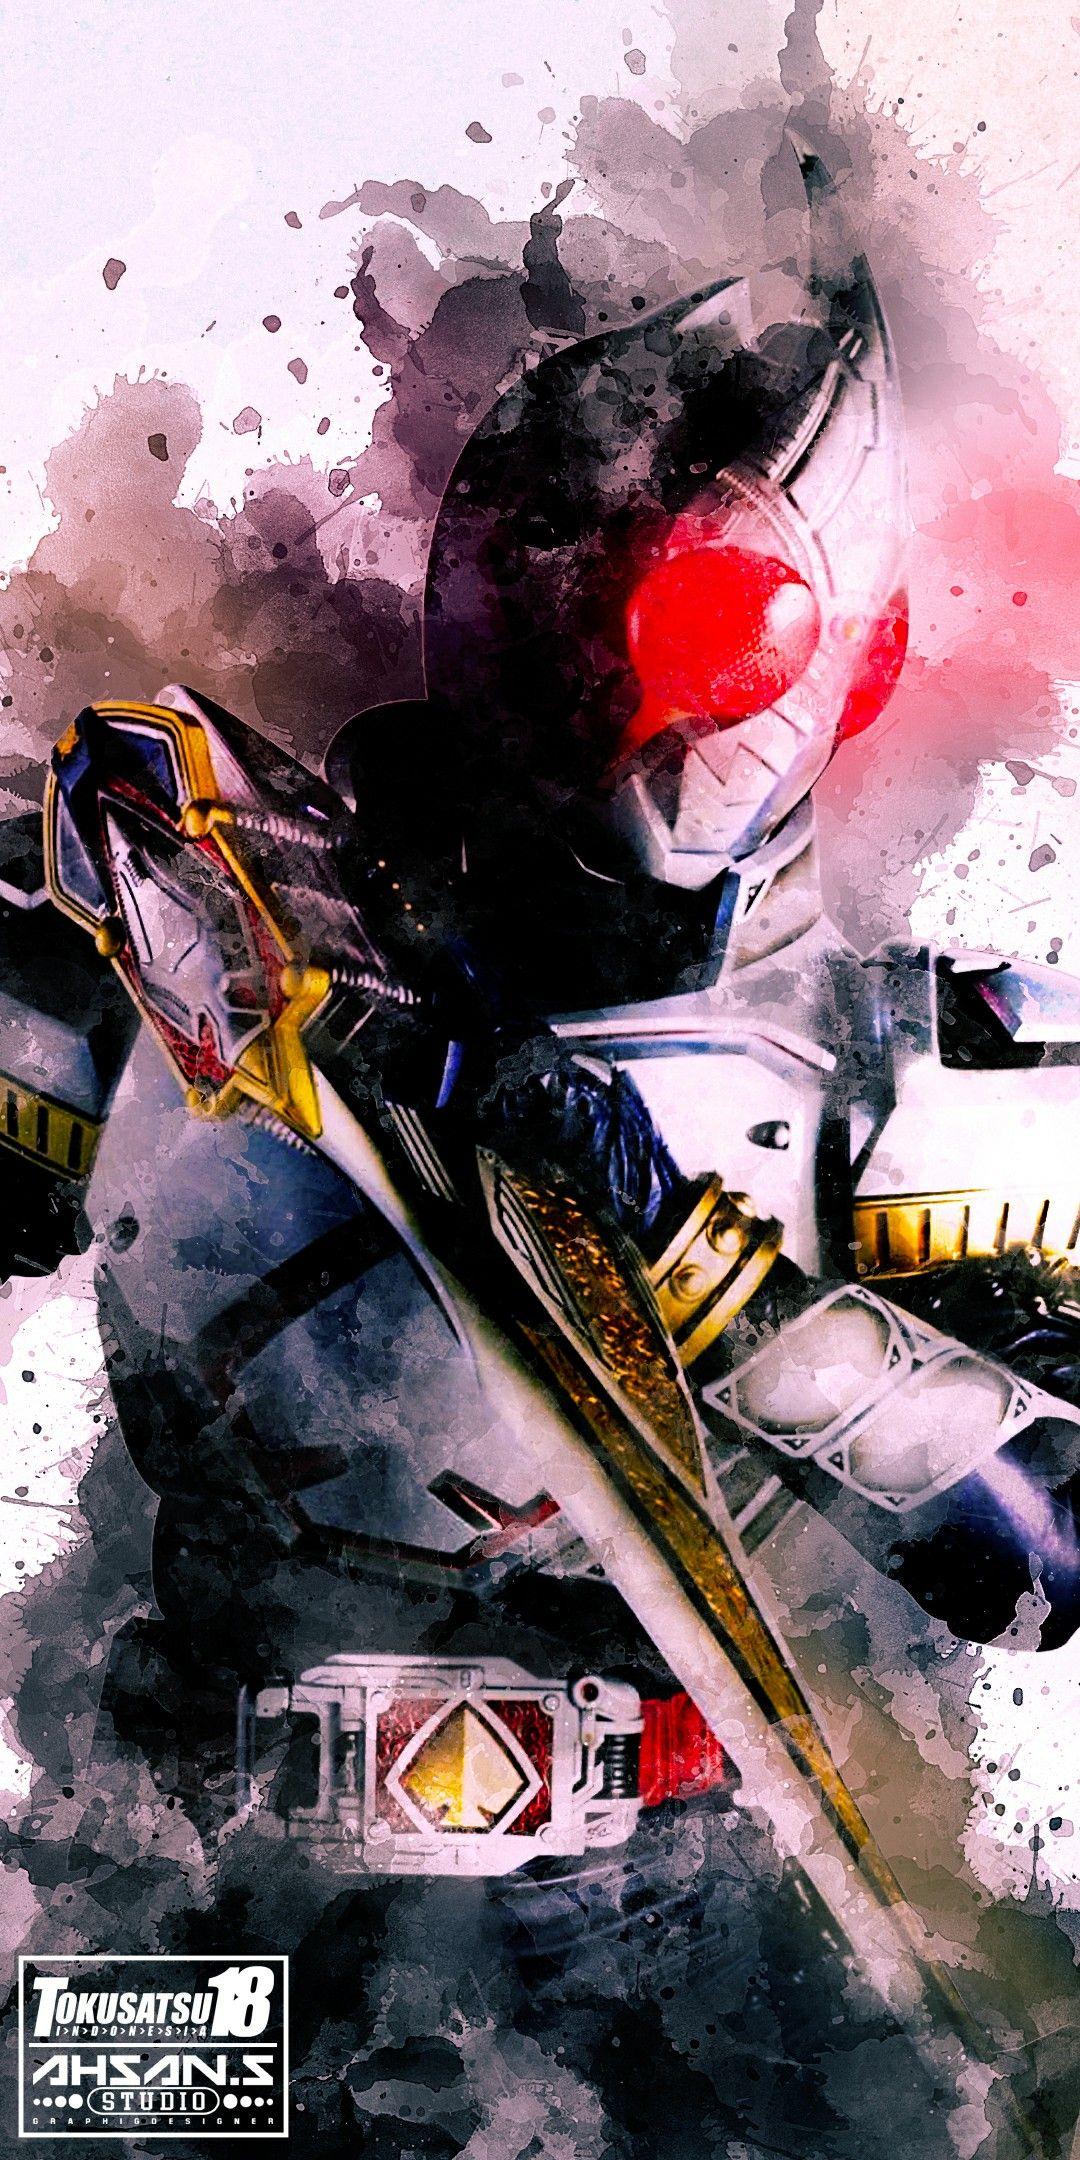 Kamen Rider Blade 18 9 หน งส อการ ต น ภาพ อะน เมะ